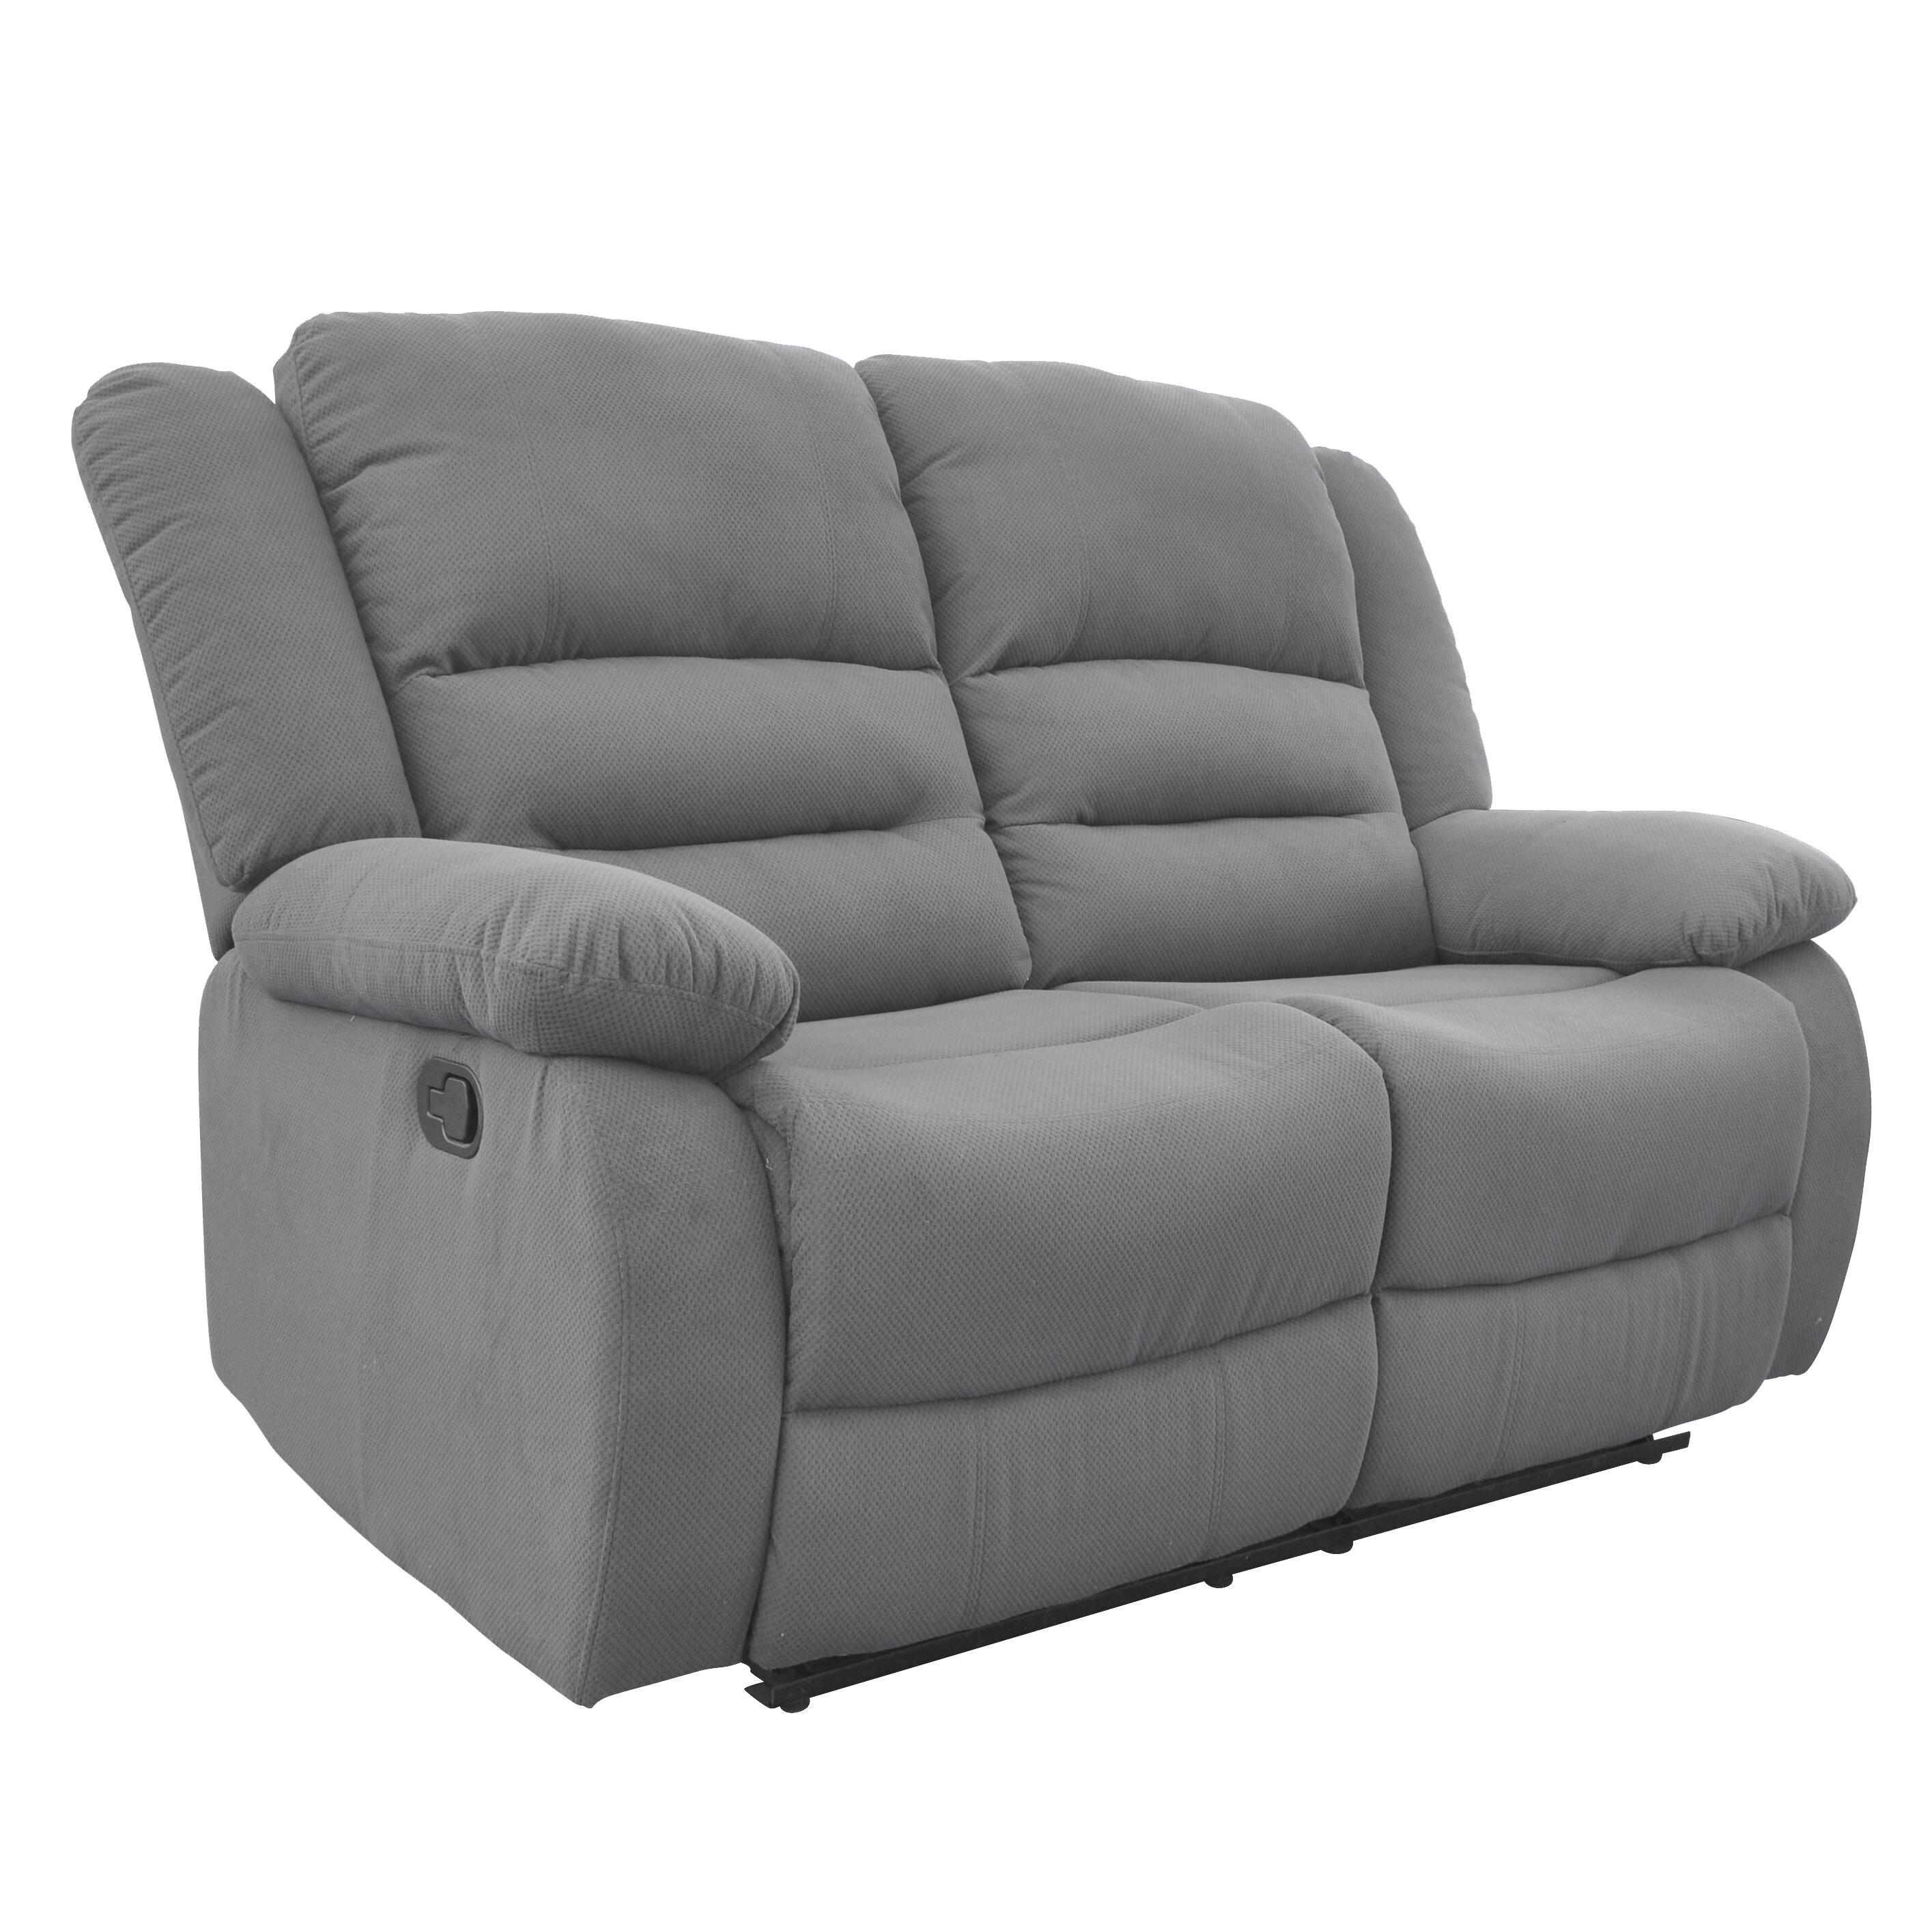 Fabulous Dedmond Reclining Loveseat Inzonedesignstudio Interior Chair Design Inzonedesignstudiocom